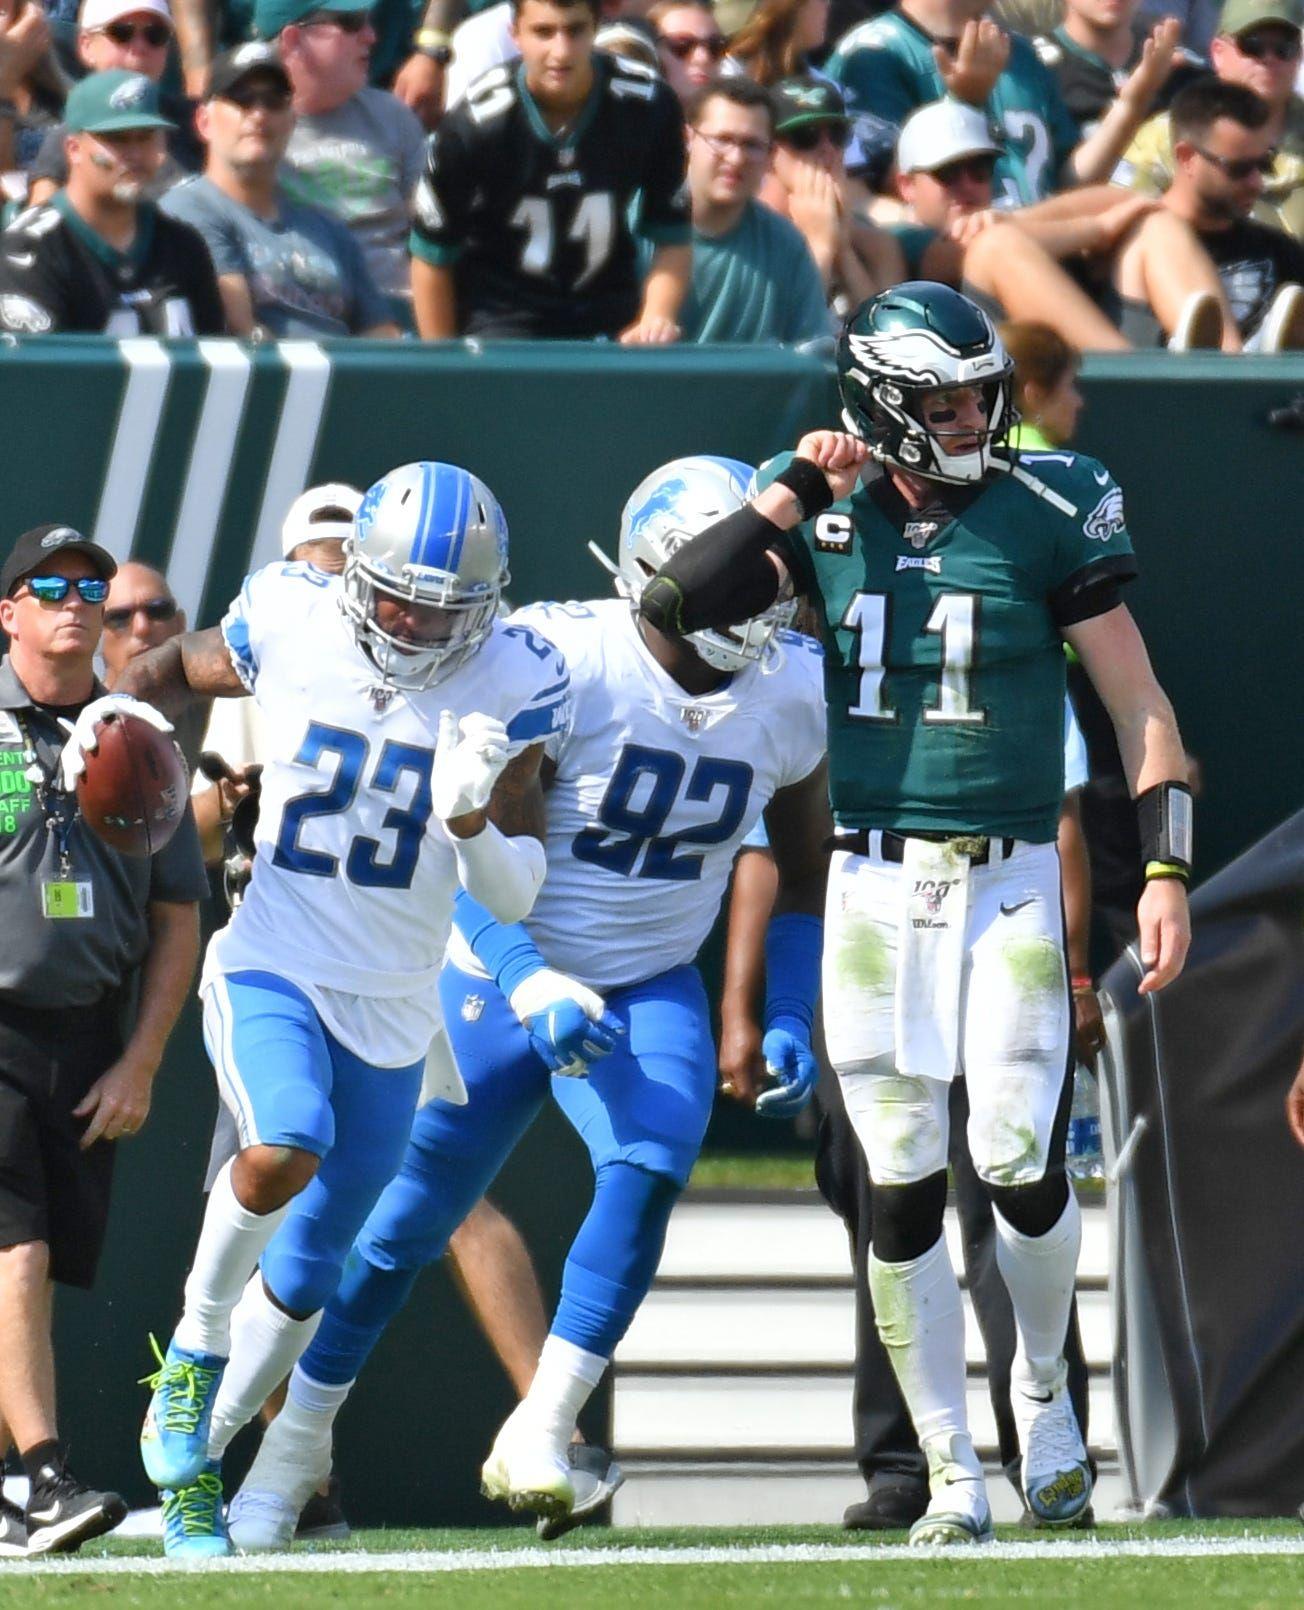 Detroit lions defense does enough to slow ailing eagles